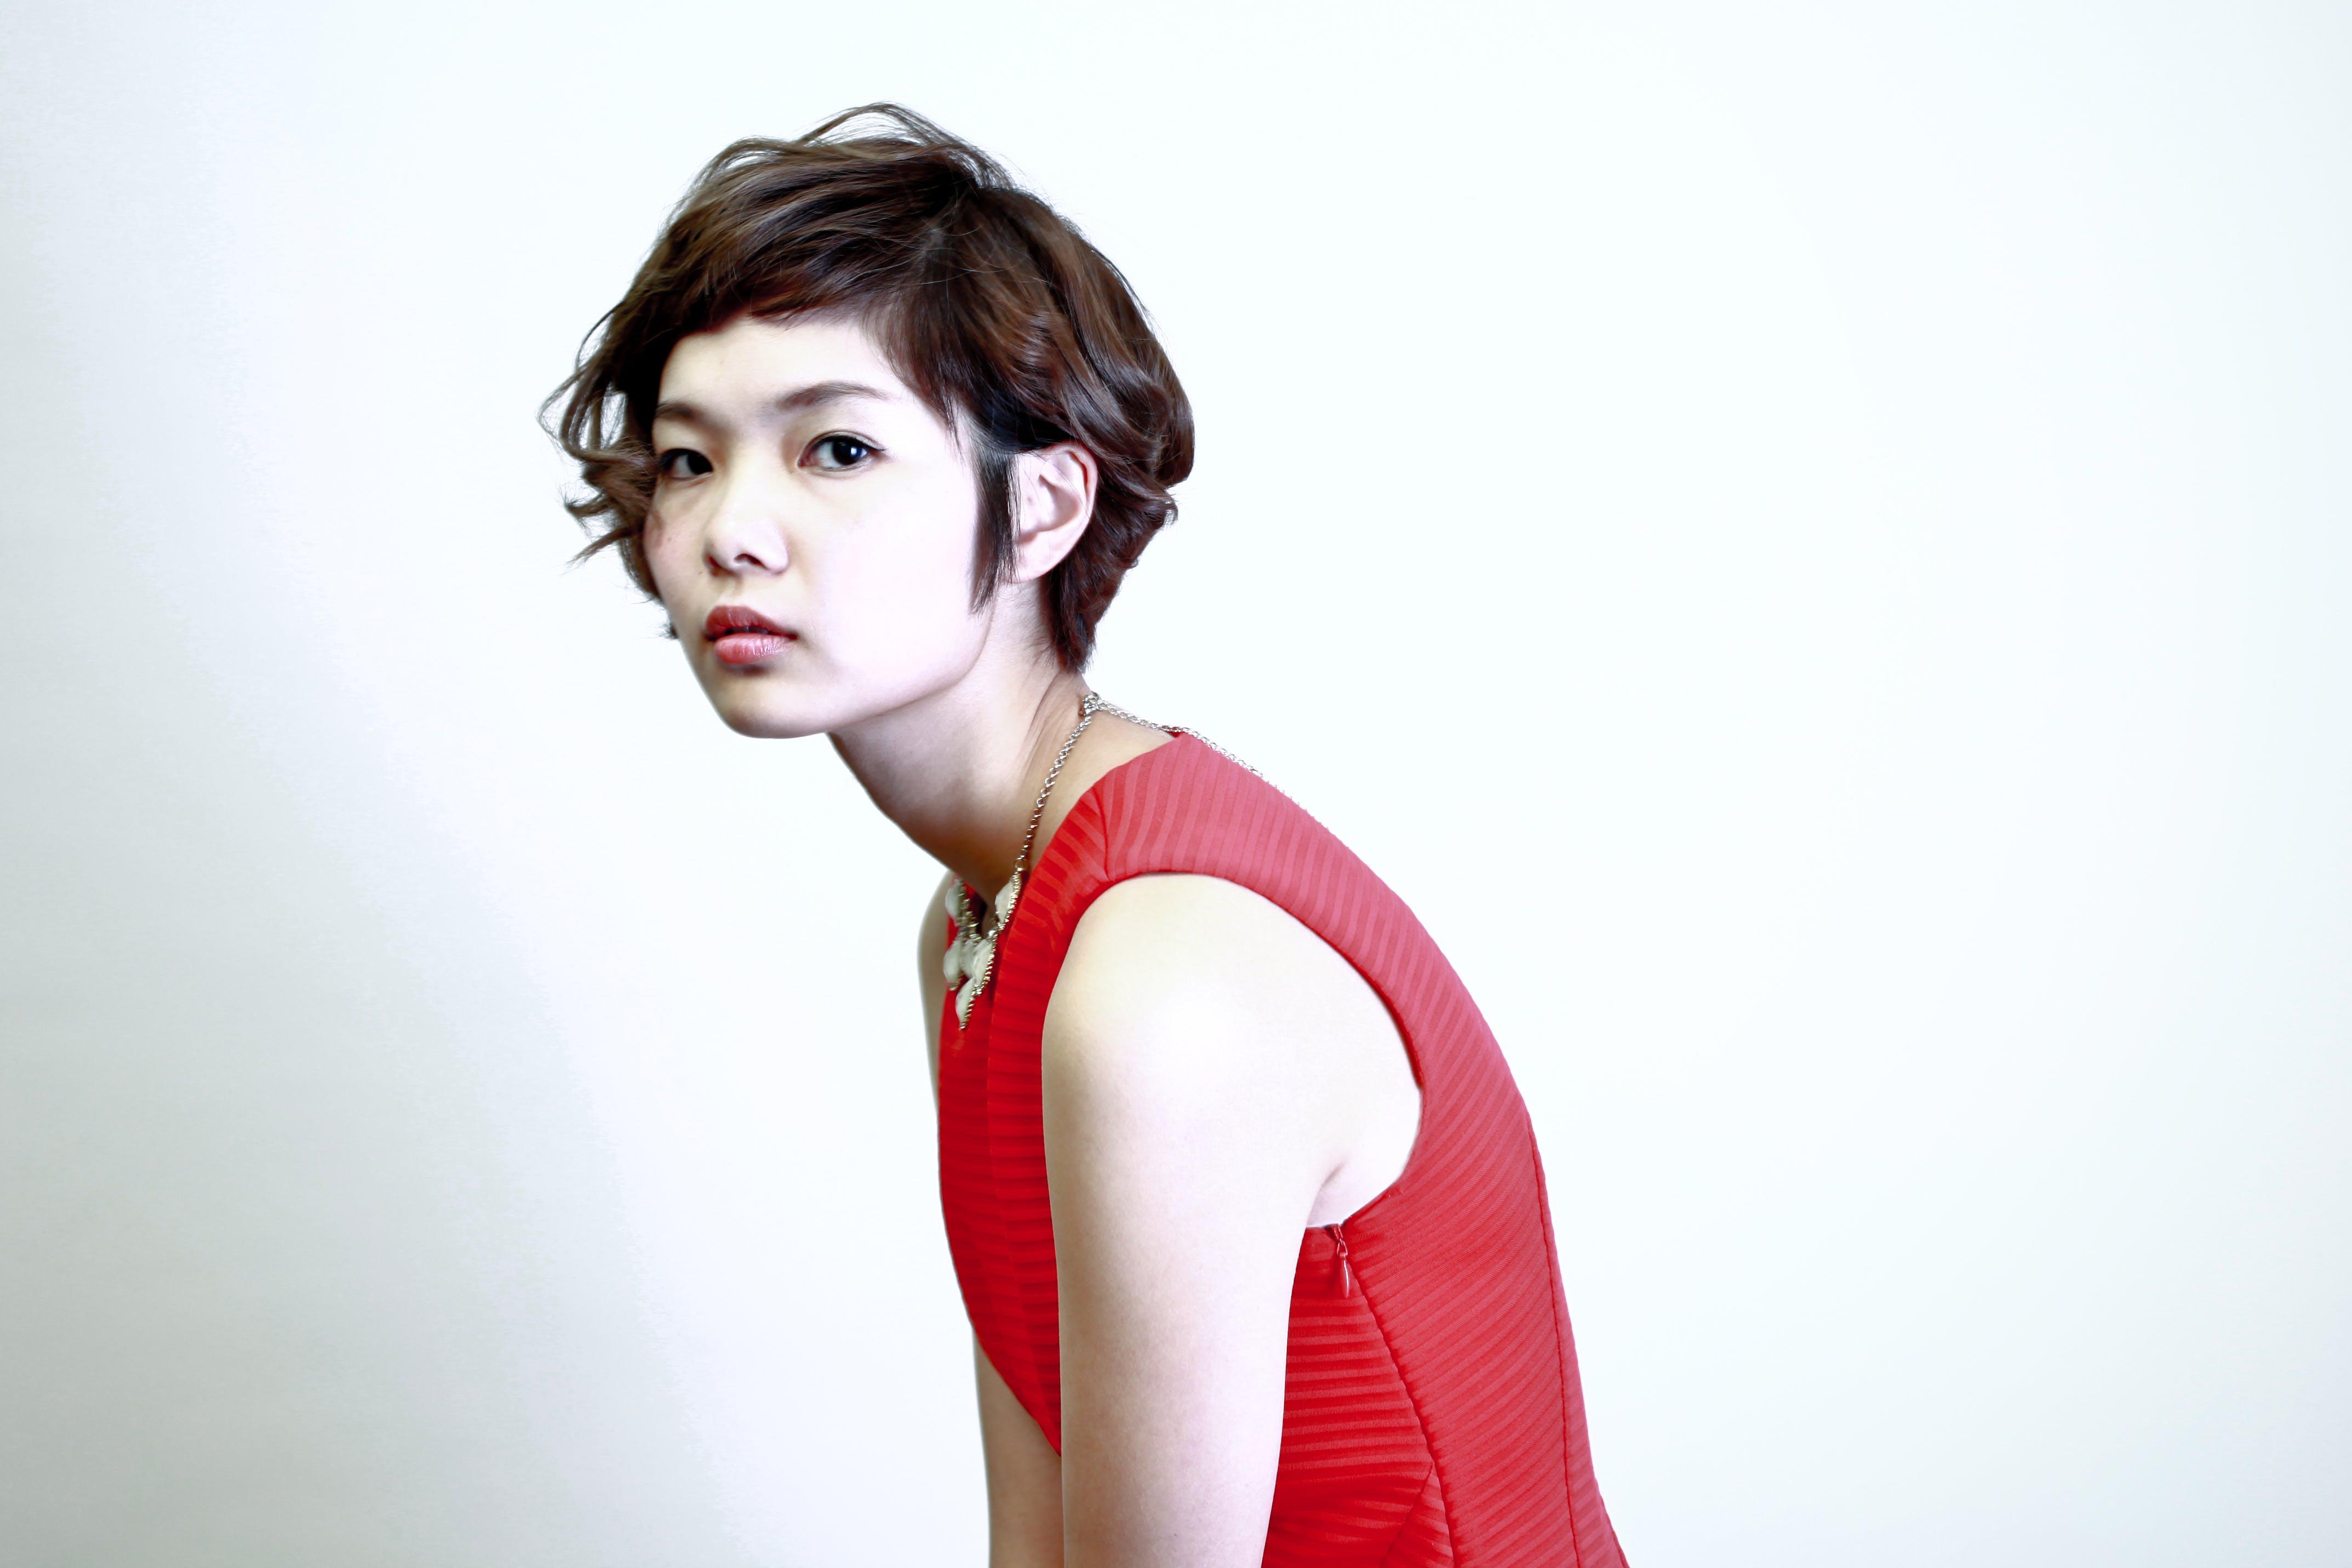 Woman Wearing Red Sleeveless Top